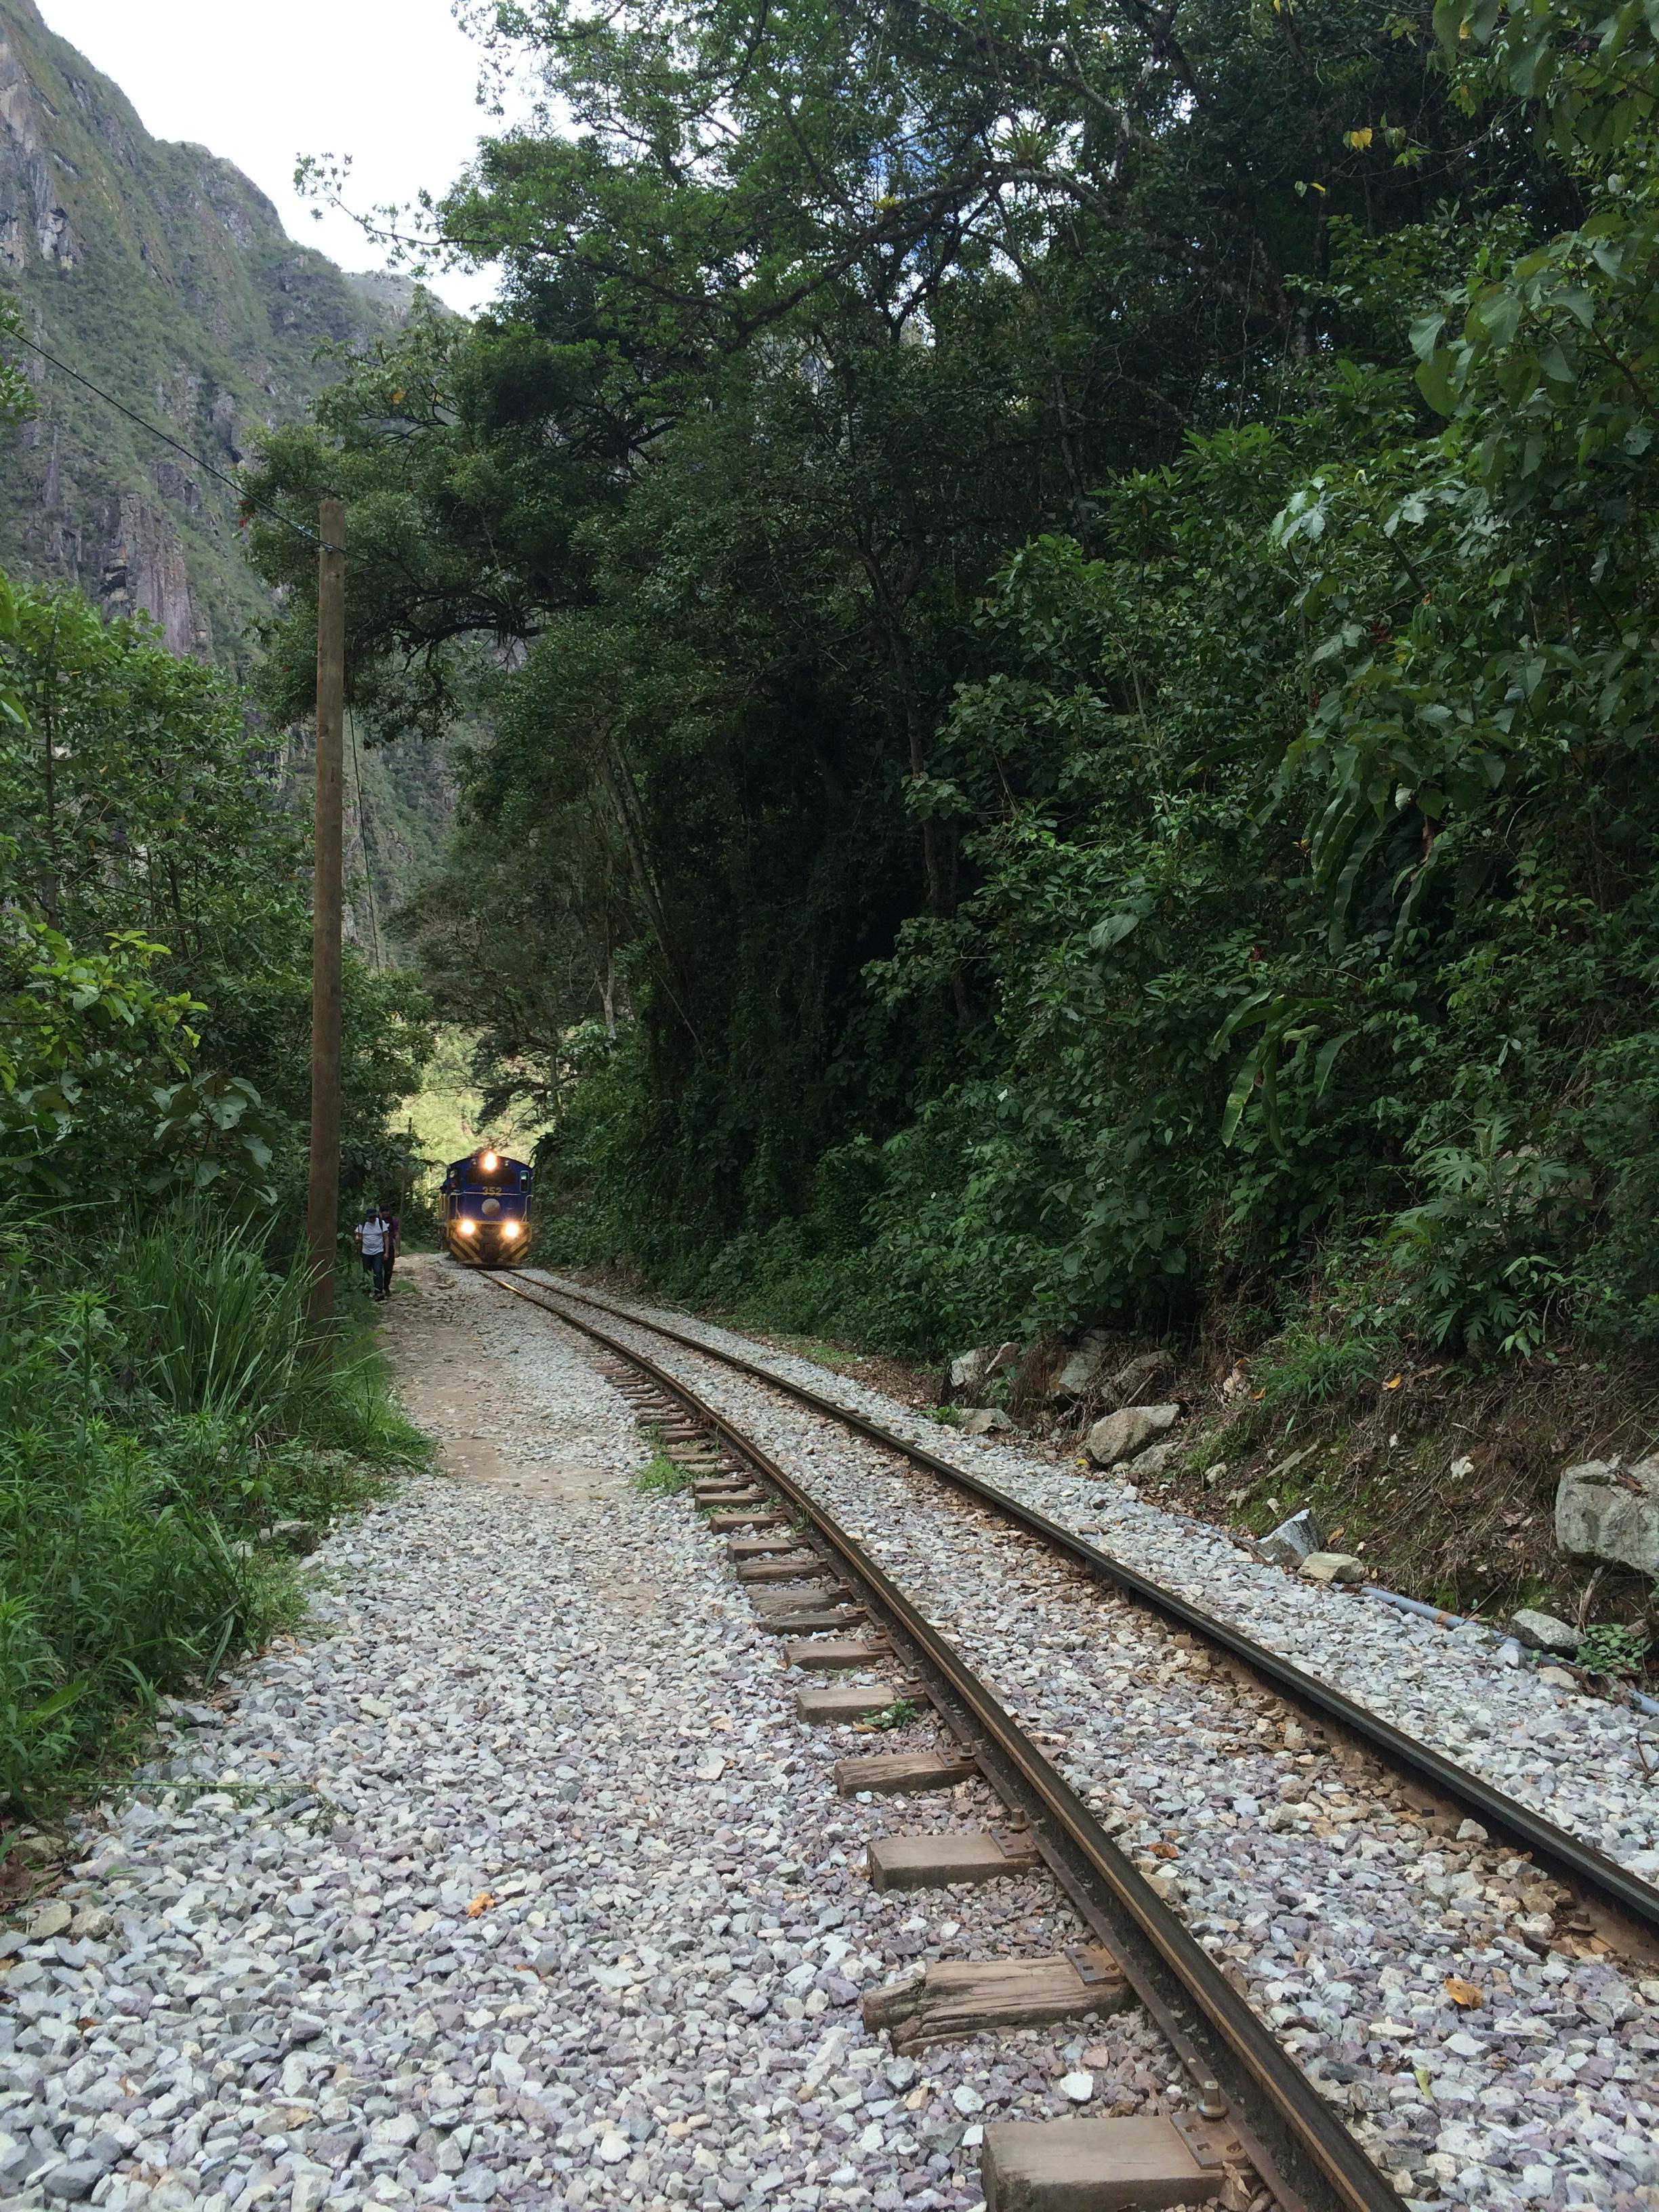 iPhone Machu Picchu 120 - Backpacking Machu Picchu: How to Get to Aguas Calientes (Photos)